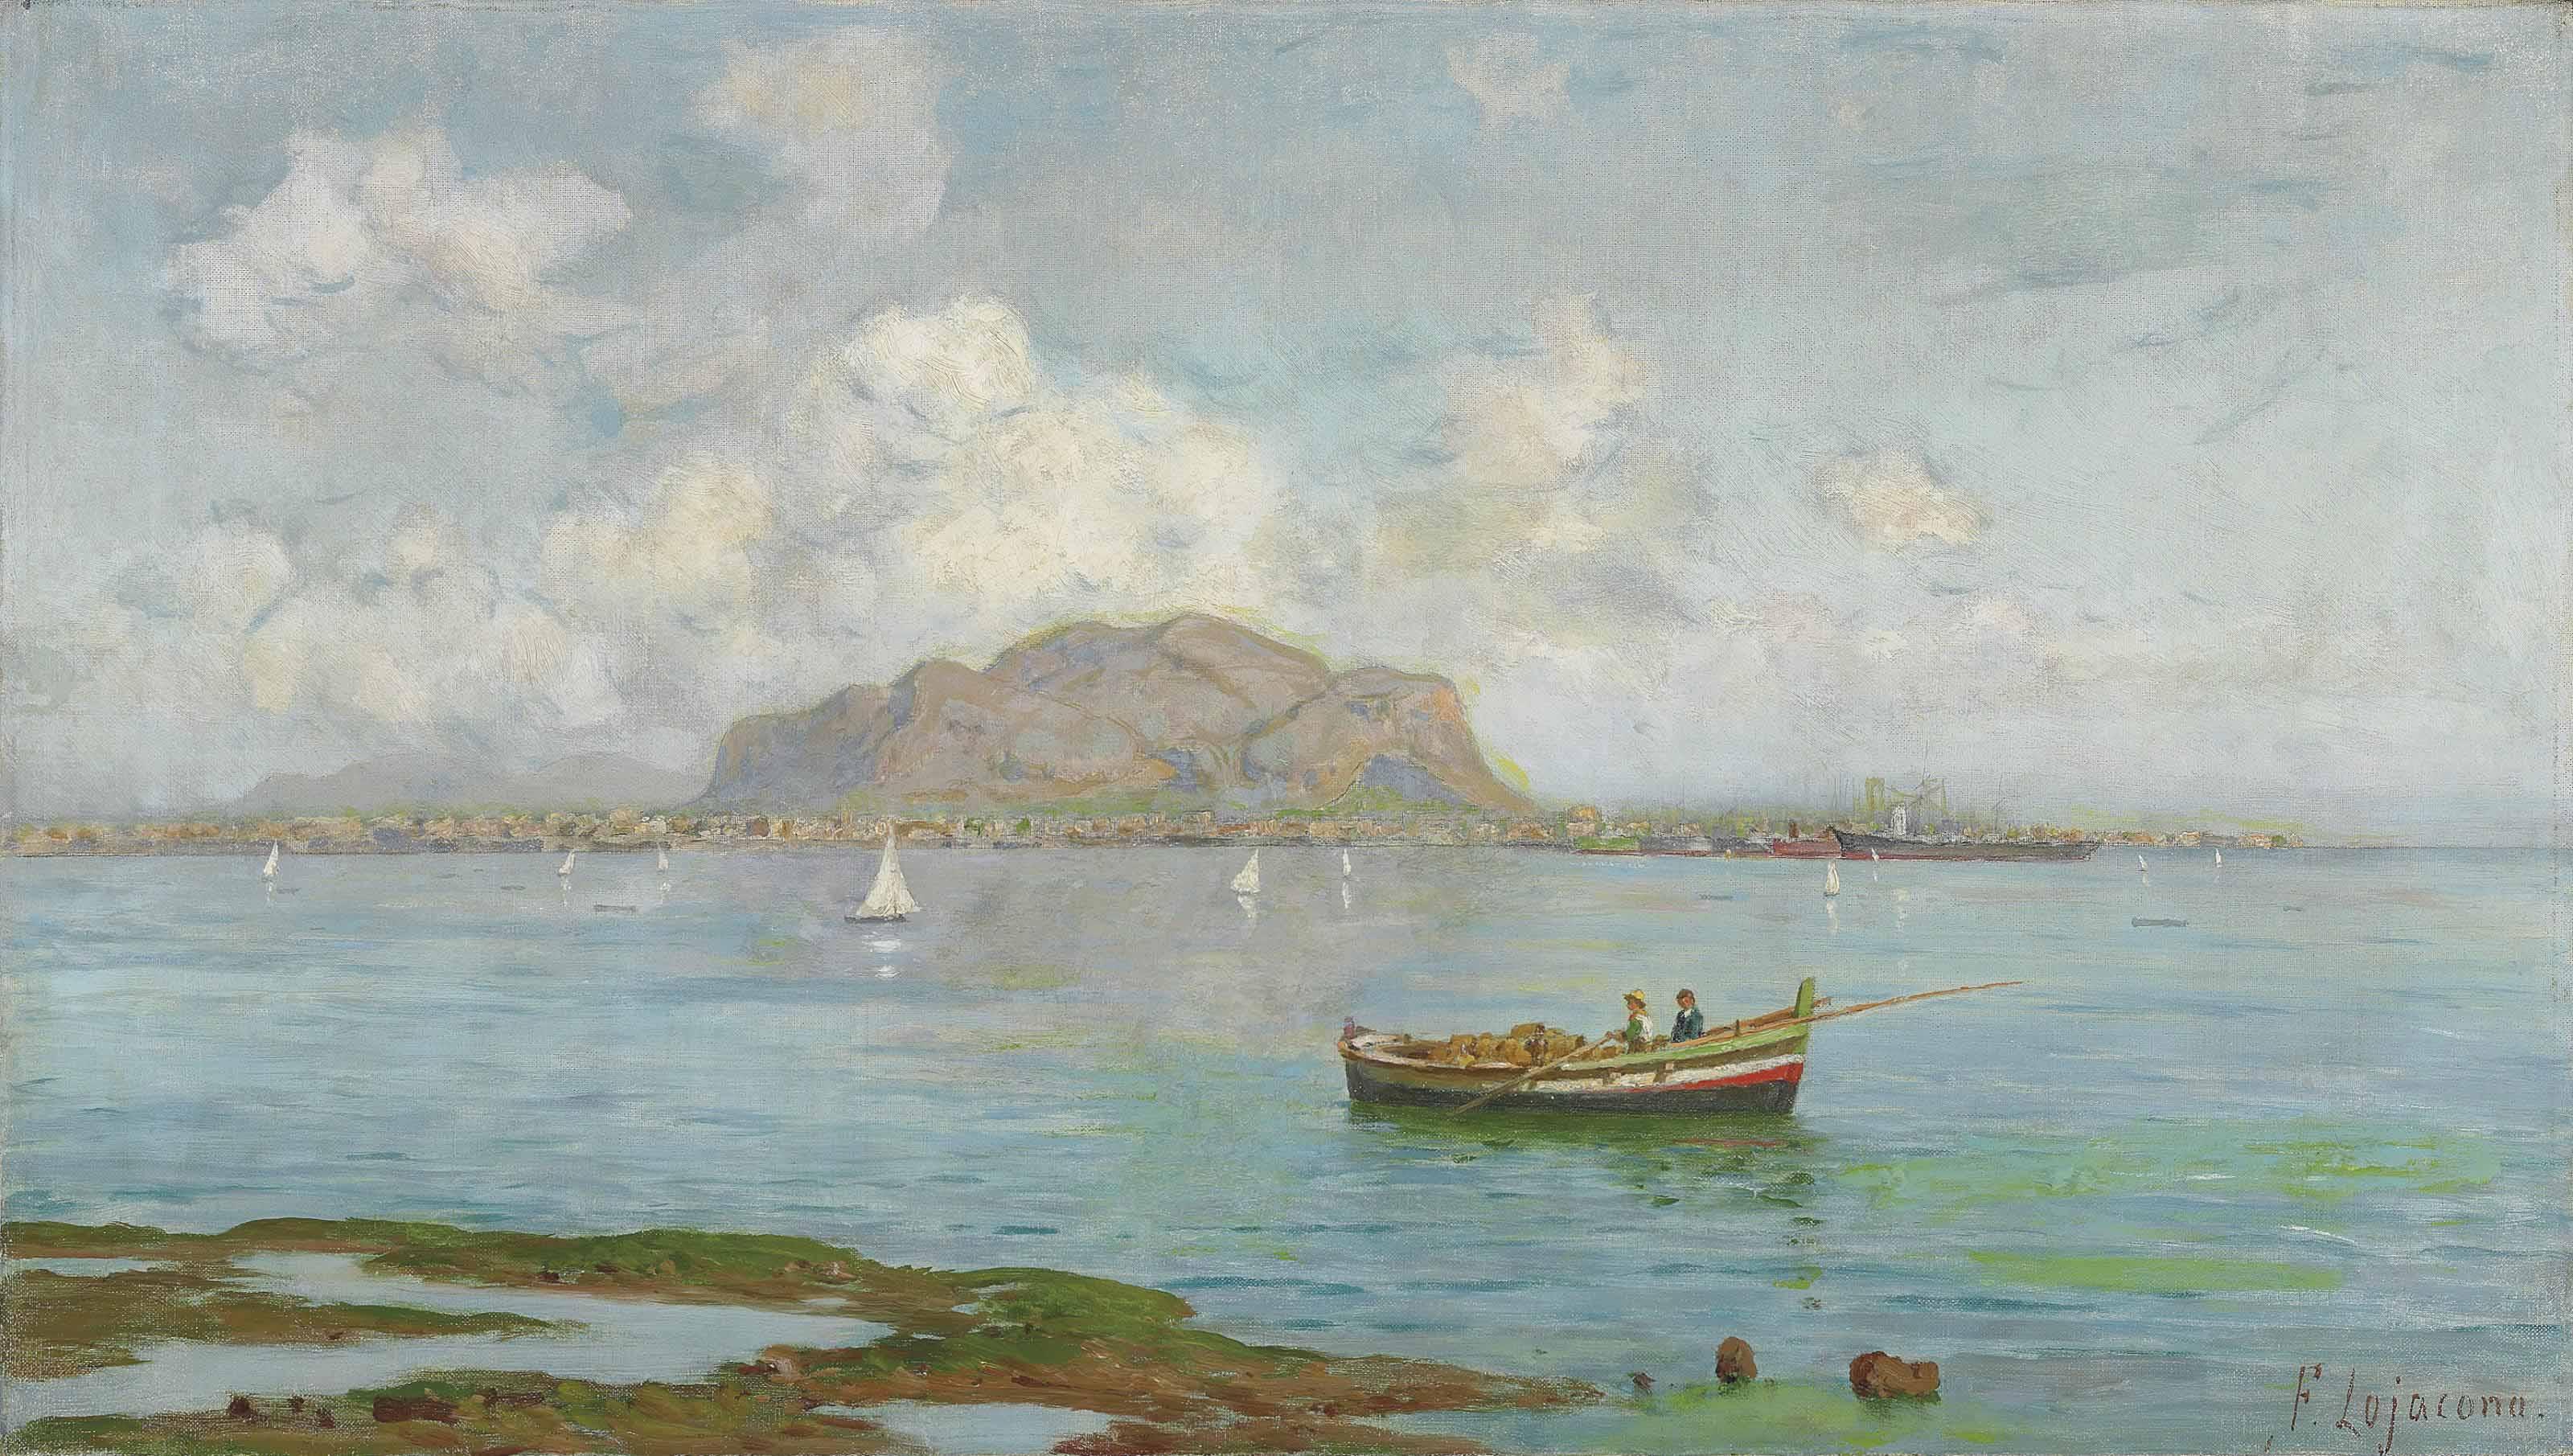 The Bay of Palermo, Monte Pellegrino beyond